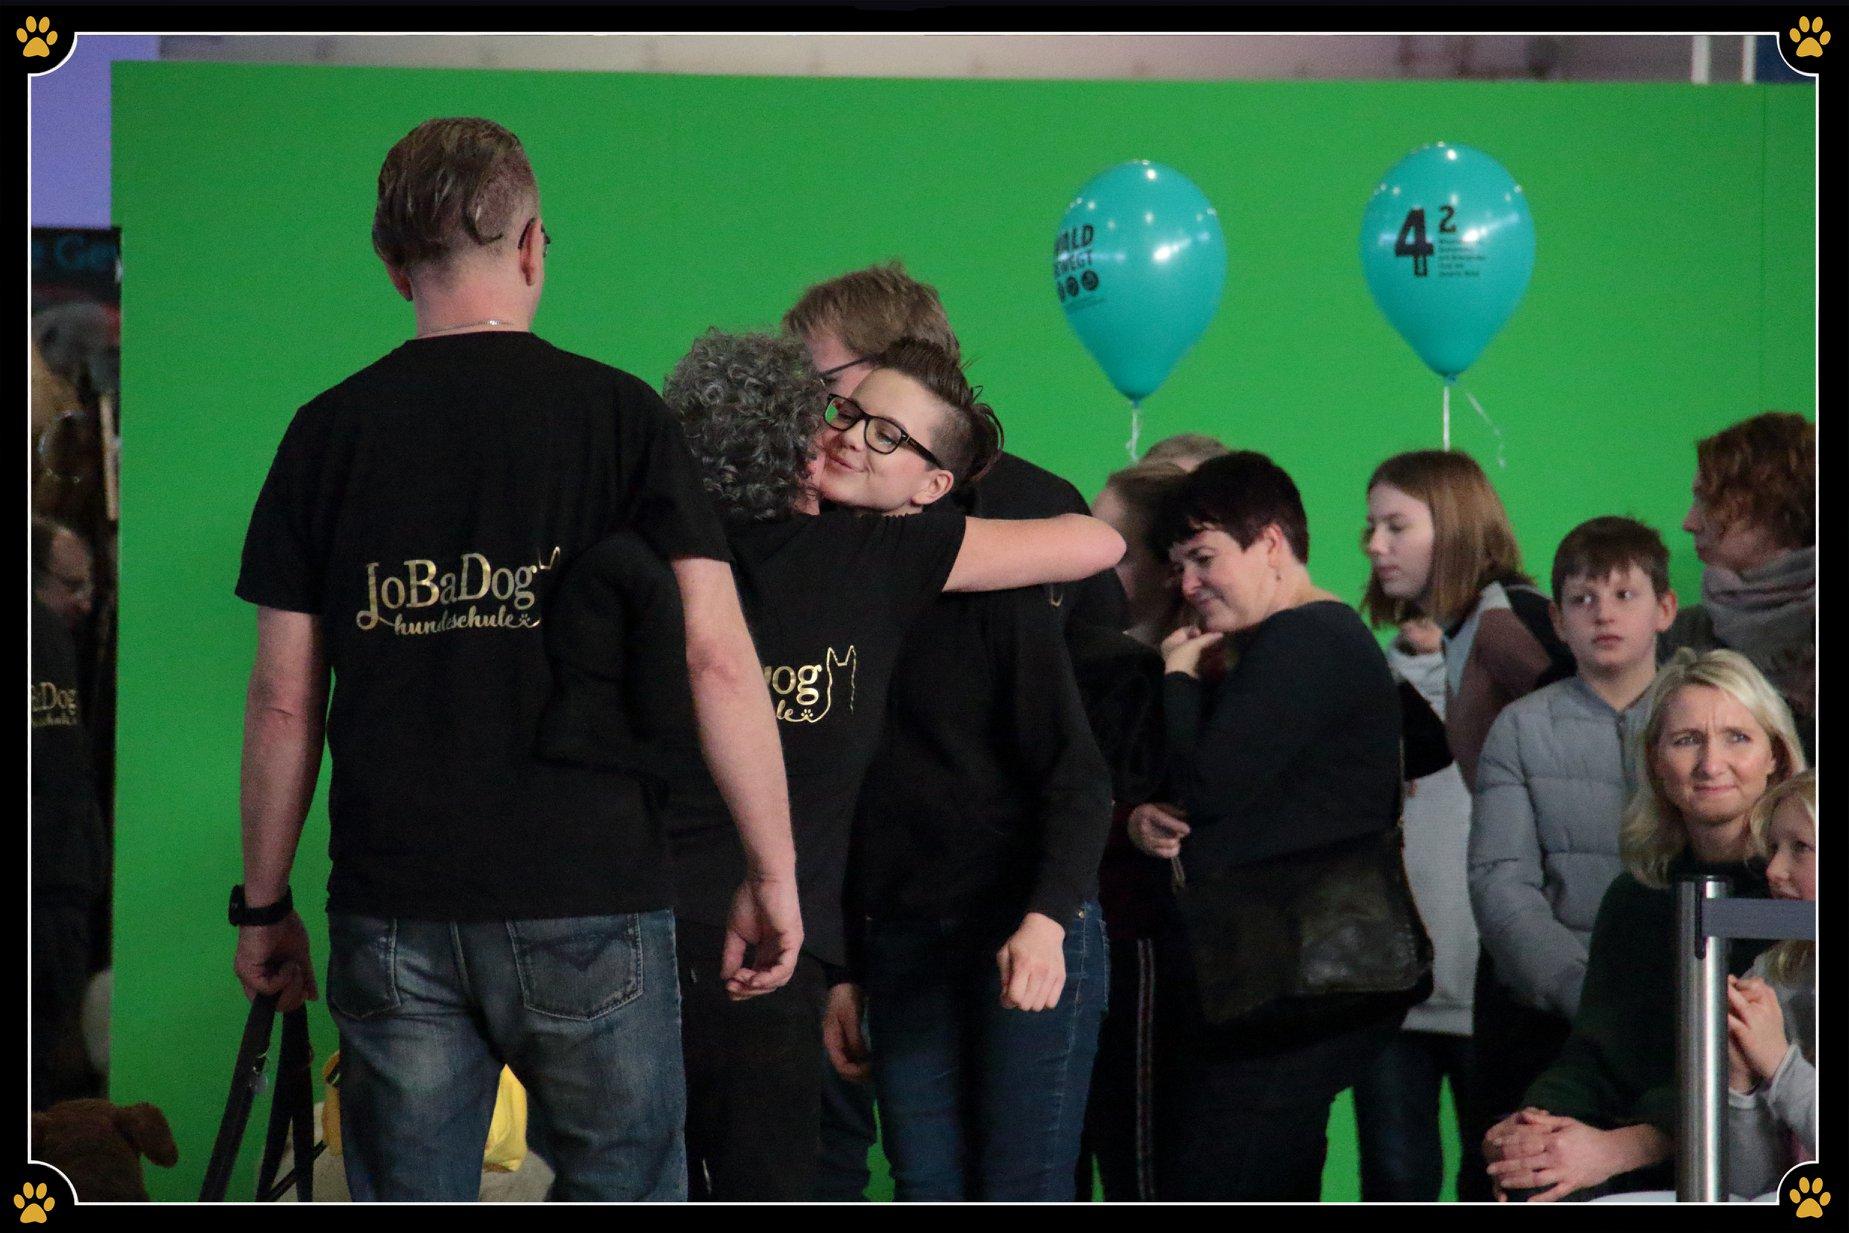 JoBaDog_Gruene_Woche_2019_Gruppe_11.jpg